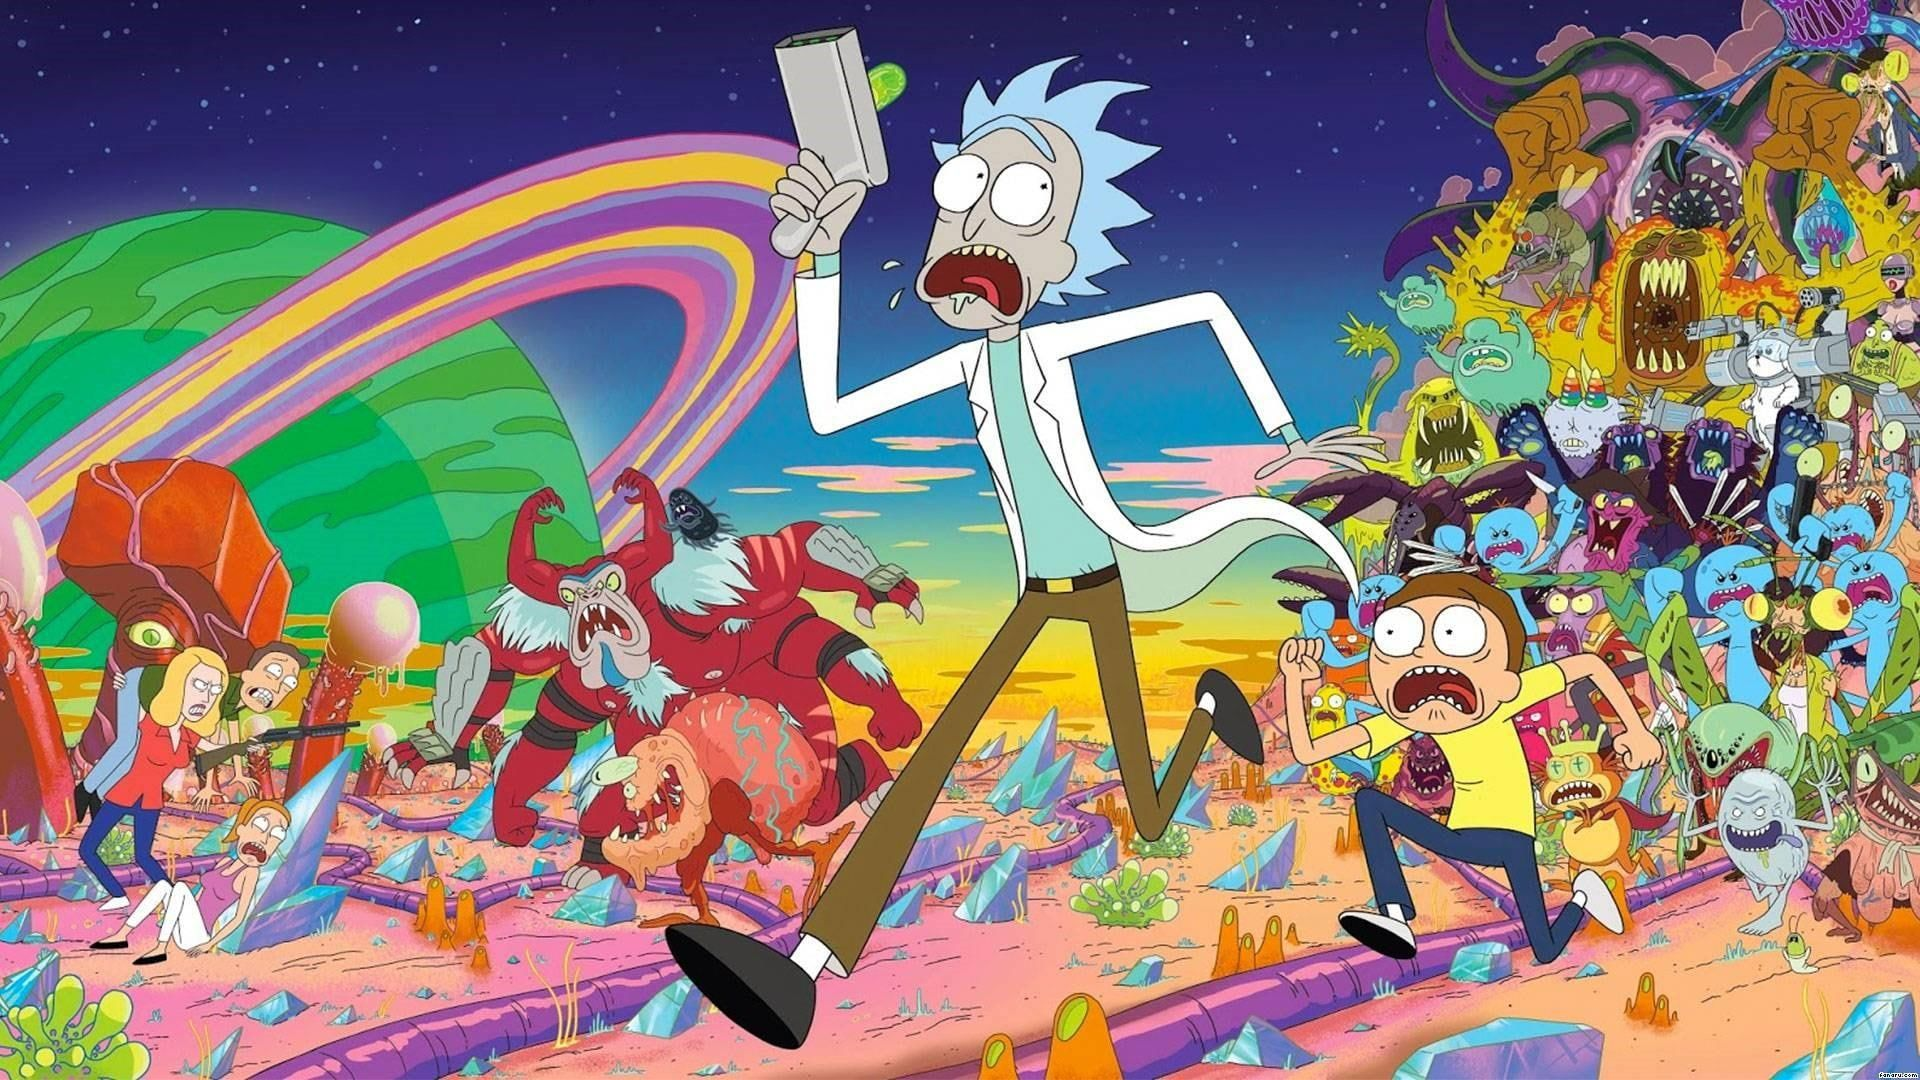 Rick And Morty Anime 1080p Wallpaper Hdwallpaper Desktop Cartoon Wallpaper Rick And Morty Poster Rick And Morty Season Rick and morty art hd wallpaper